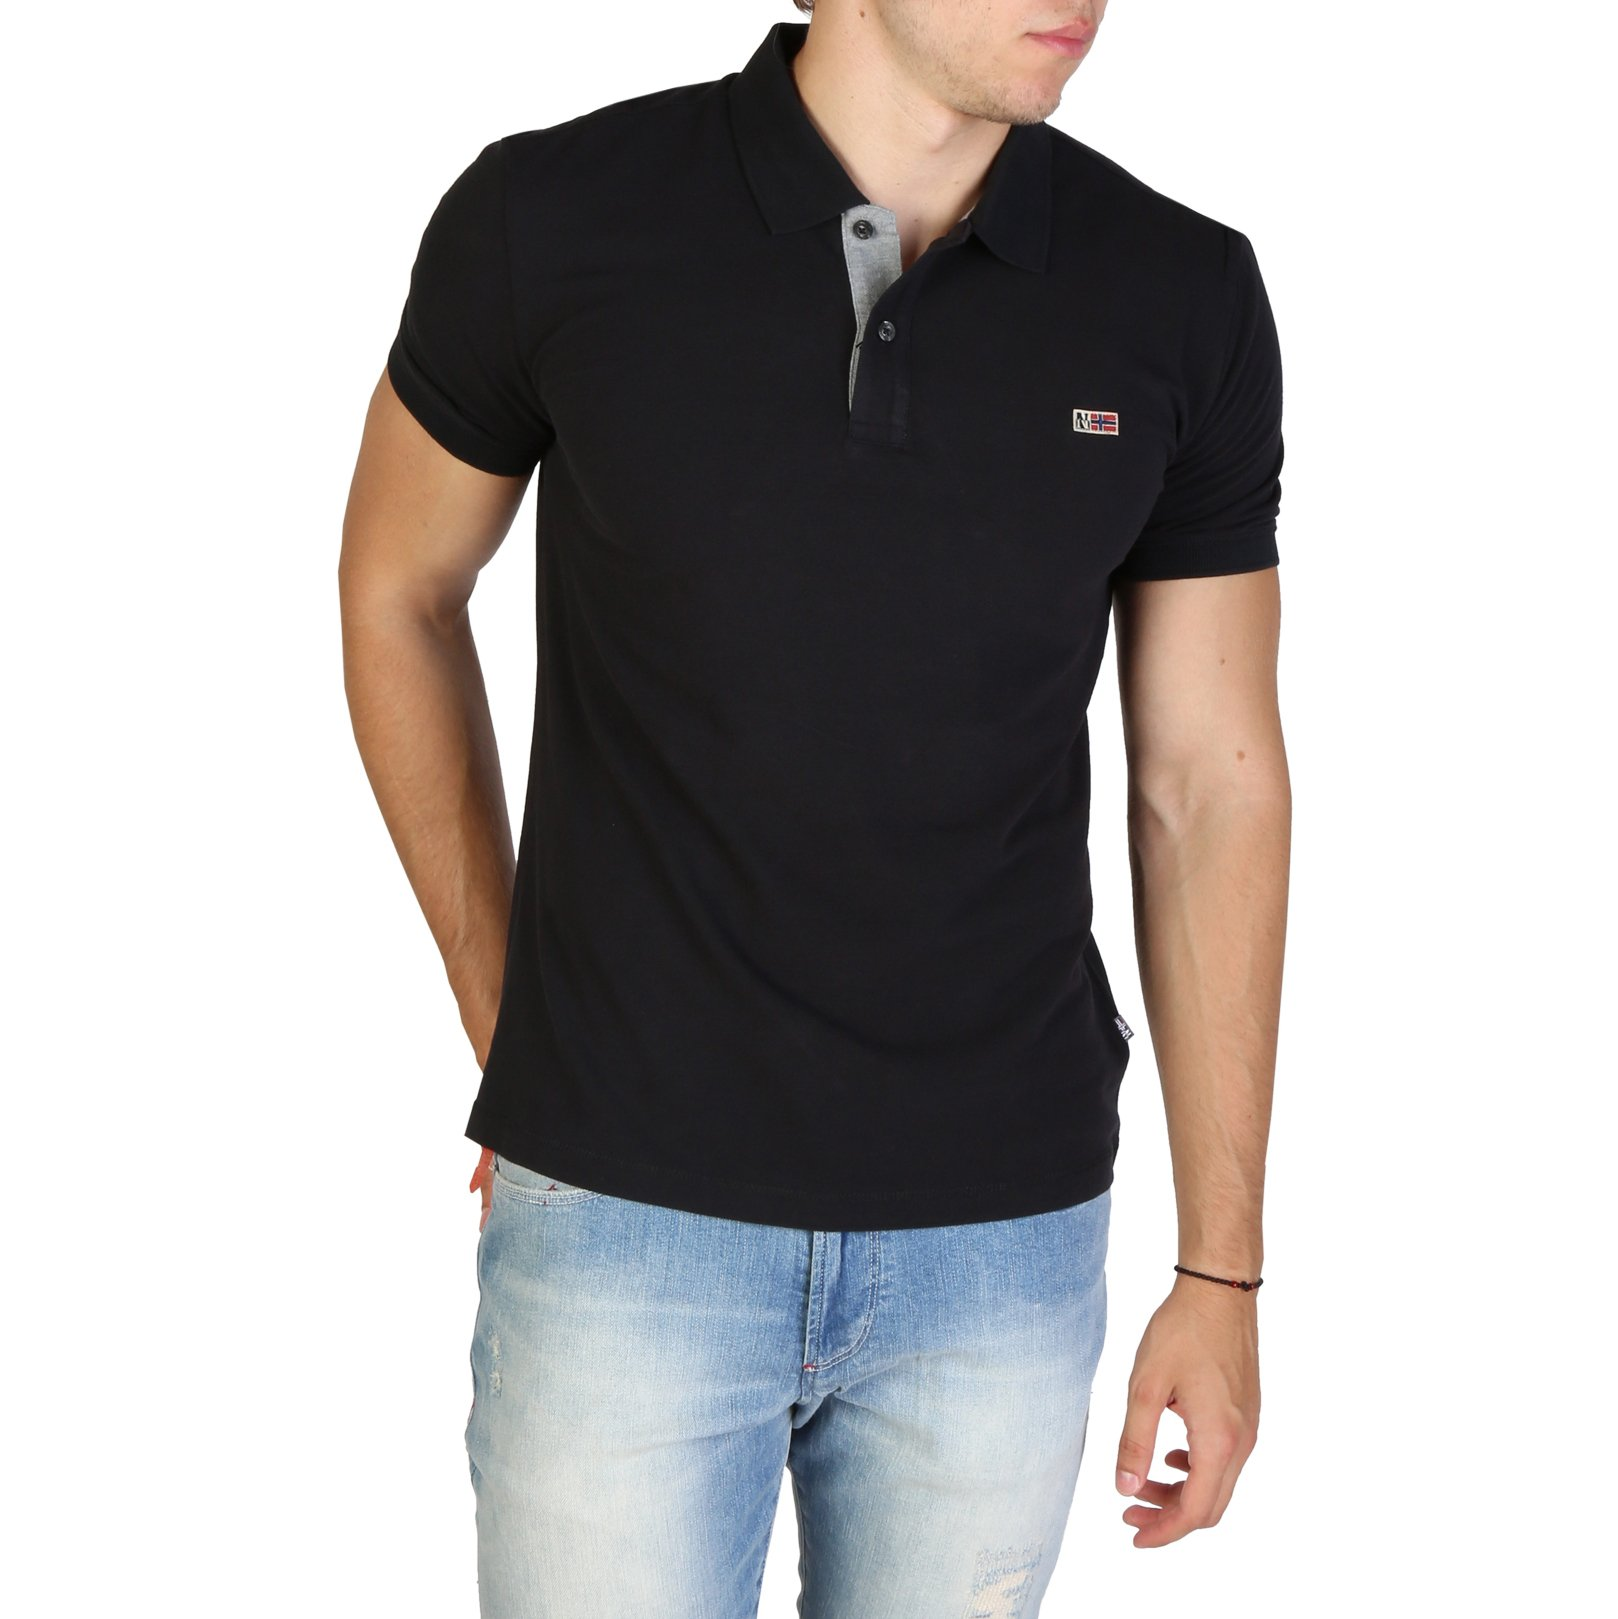 Napapijri Men's Polo Shirt Various Colours TALY3_NP0A4EGD - black S